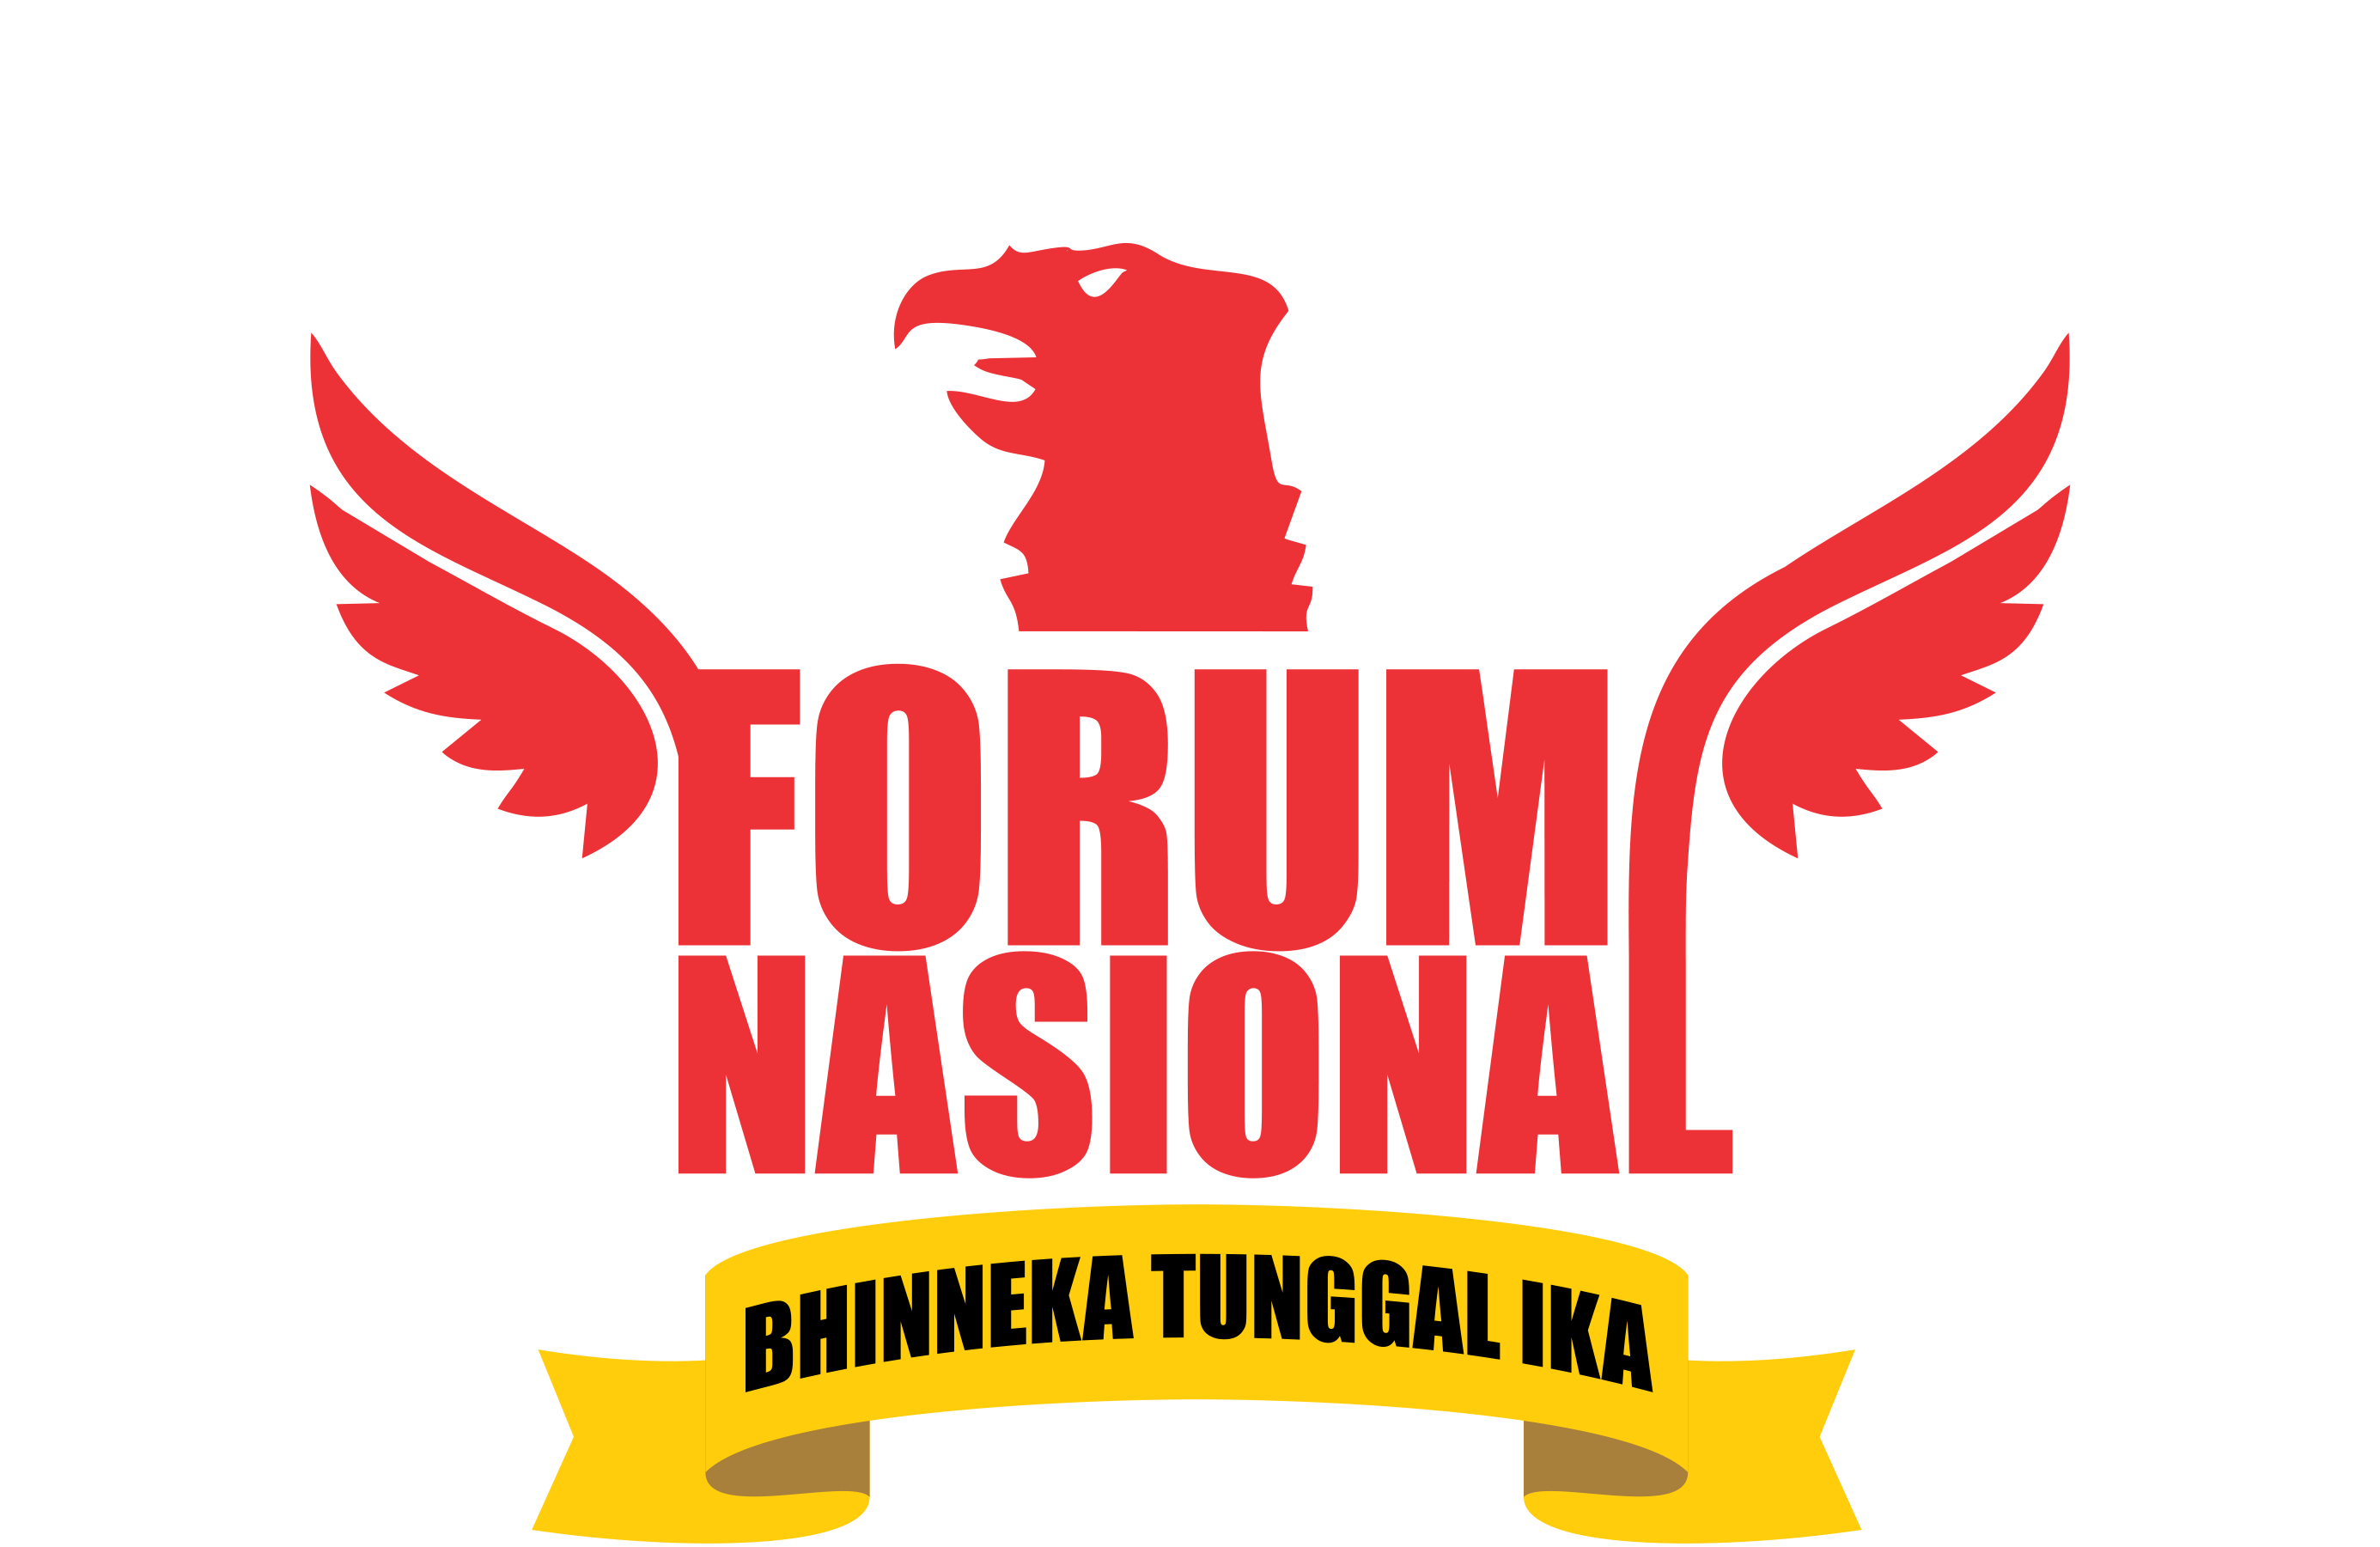 Forum Nasional Bhinneka Tunggal Ika